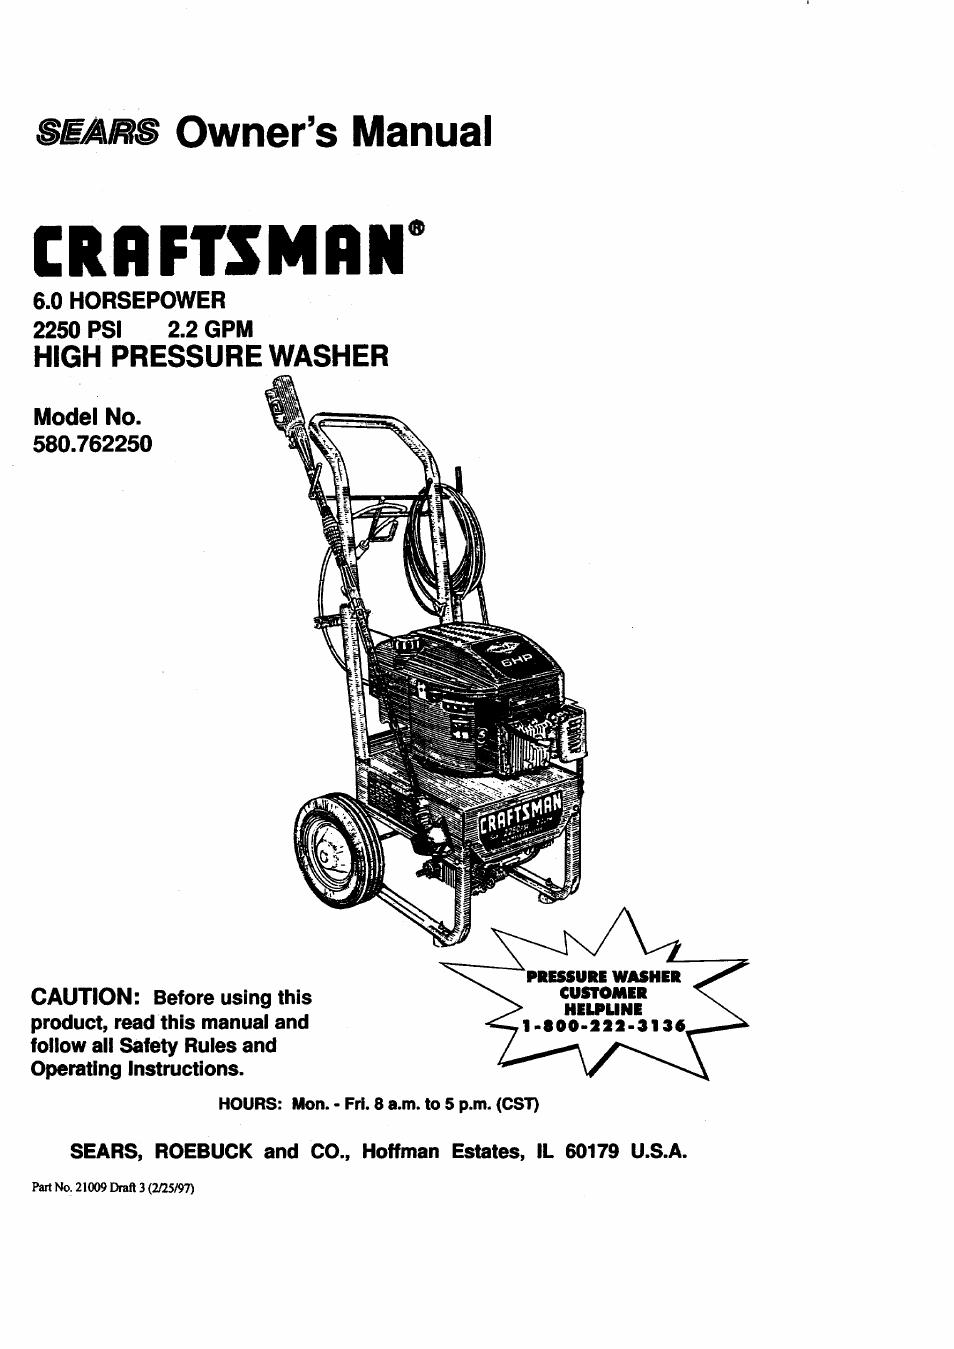 craftsman pressure washer manual 580